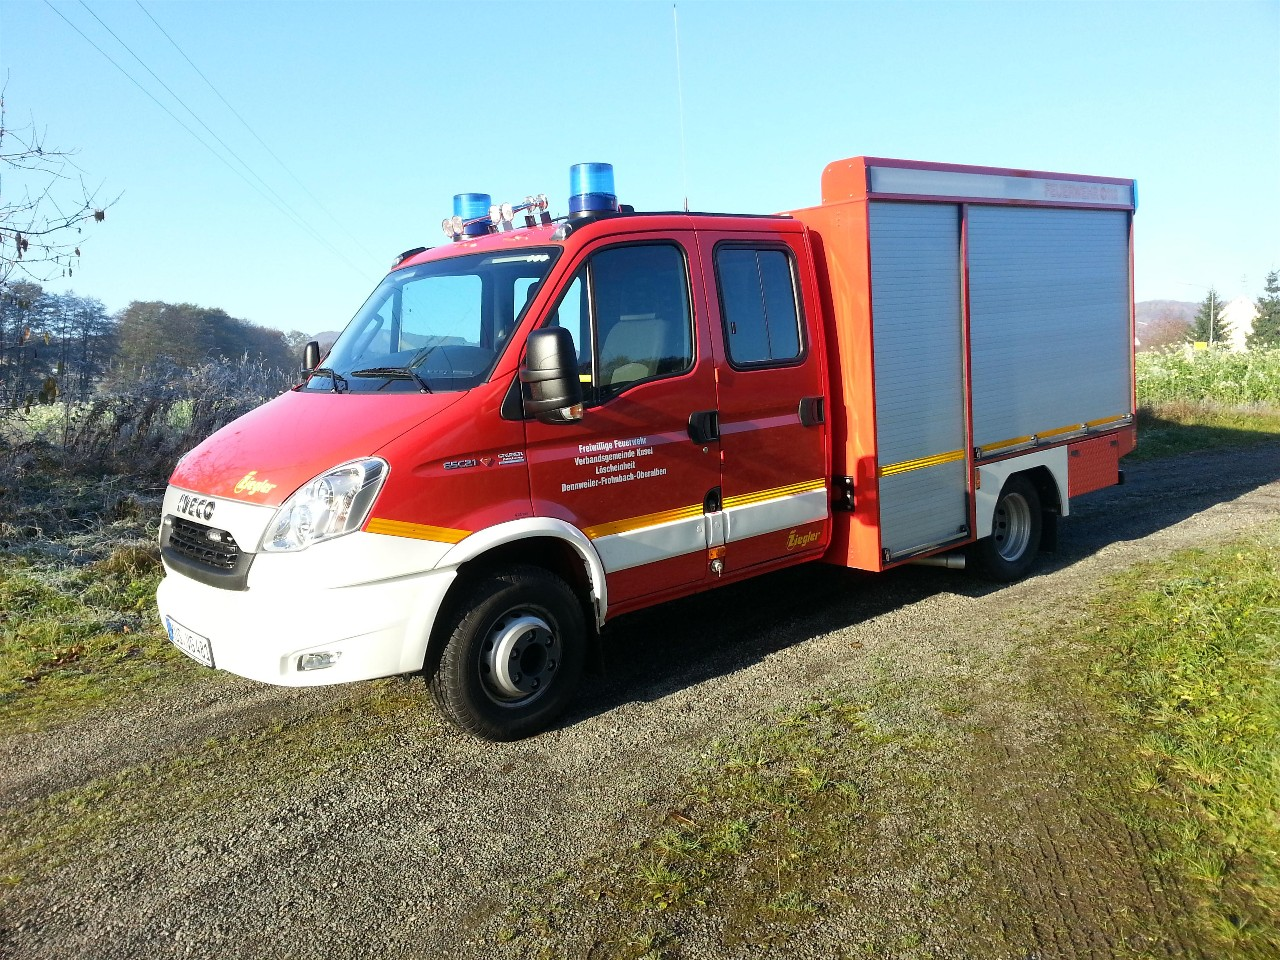 TSF-W(Feuerwehr Theisbergstegen)